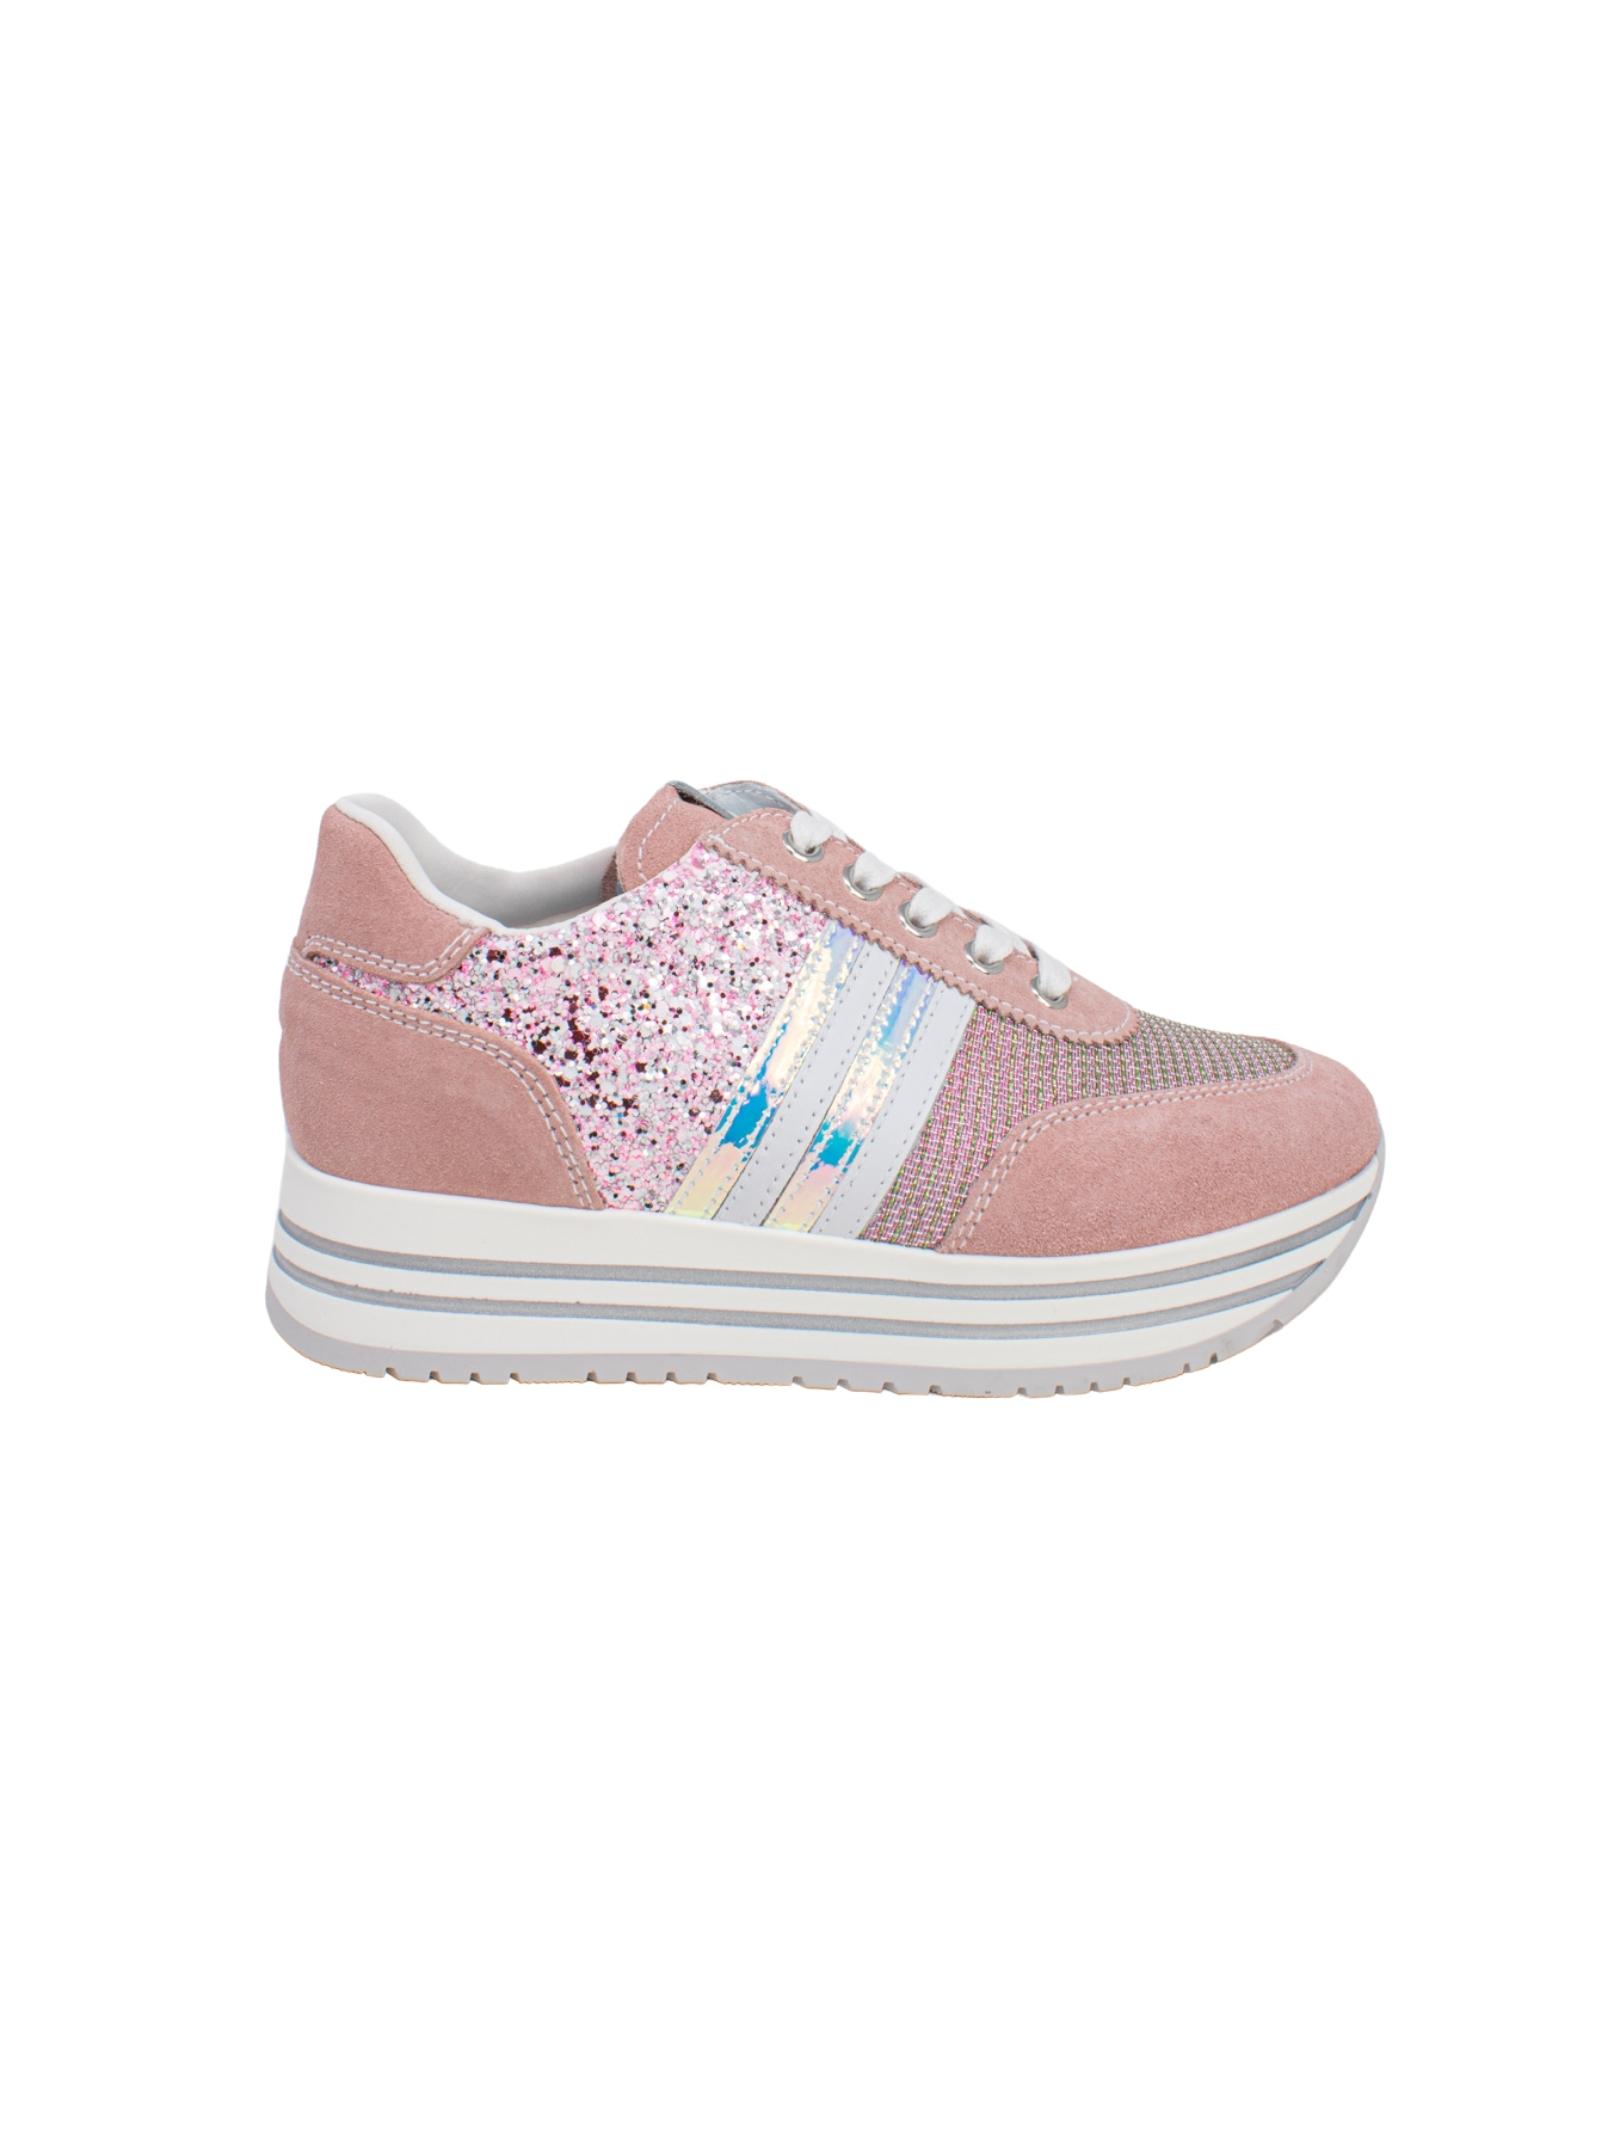 Sneakers Bambina Peonia Teen NERO GIARDINI JUNIOR | Sneakers | E131830F429